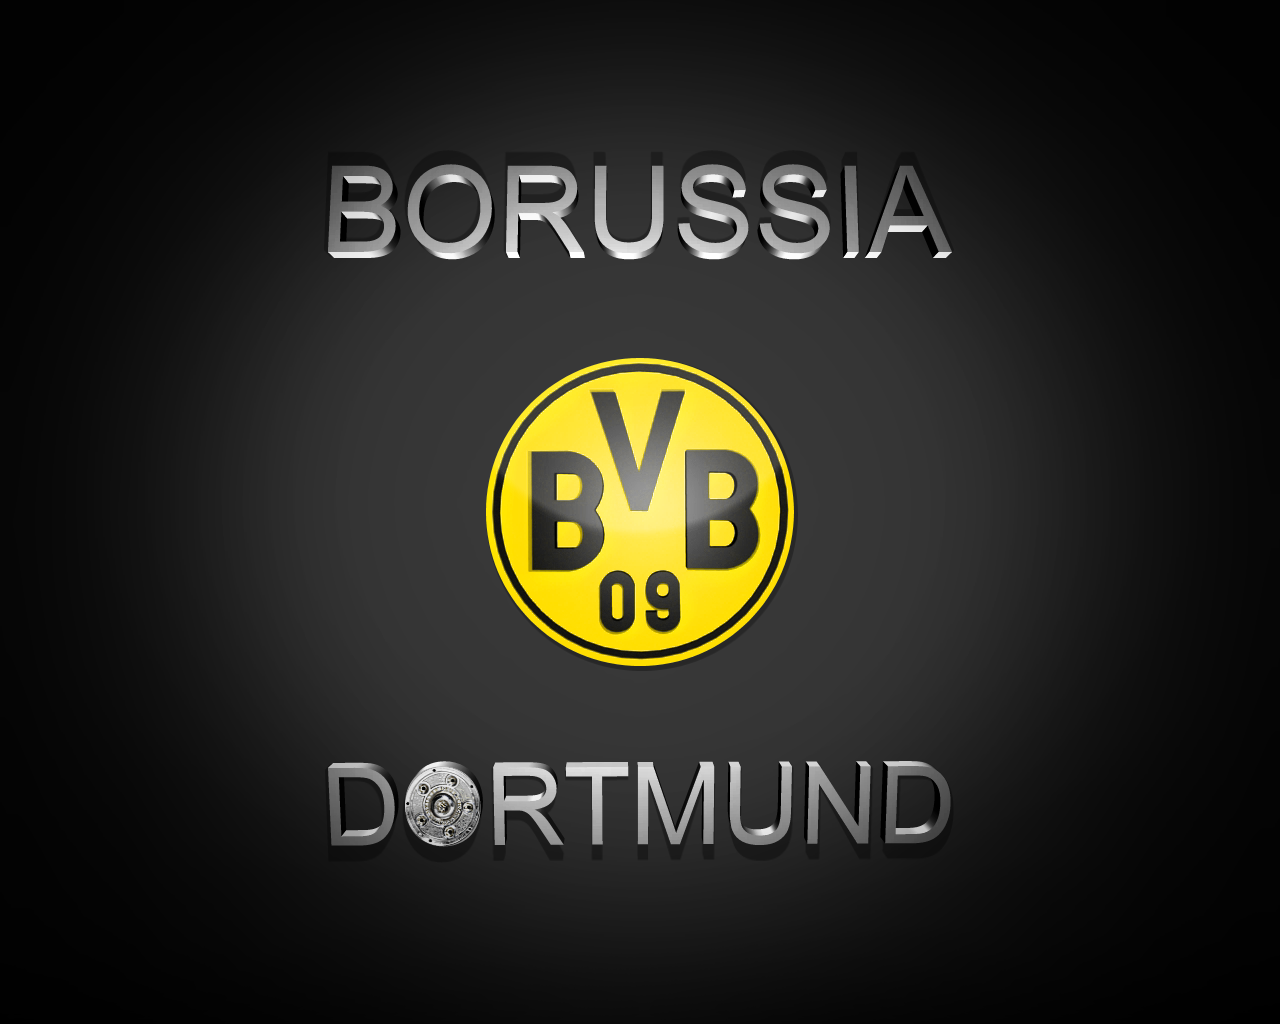 http://3.bp.blogspot.com/-mIENpyg6vqQ/Thpl1LUyIwI/AAAAAAAAA6I/yd_Ol_7Rsv4/s1600/Borussia+Dortmund+Wallpaper+5.png